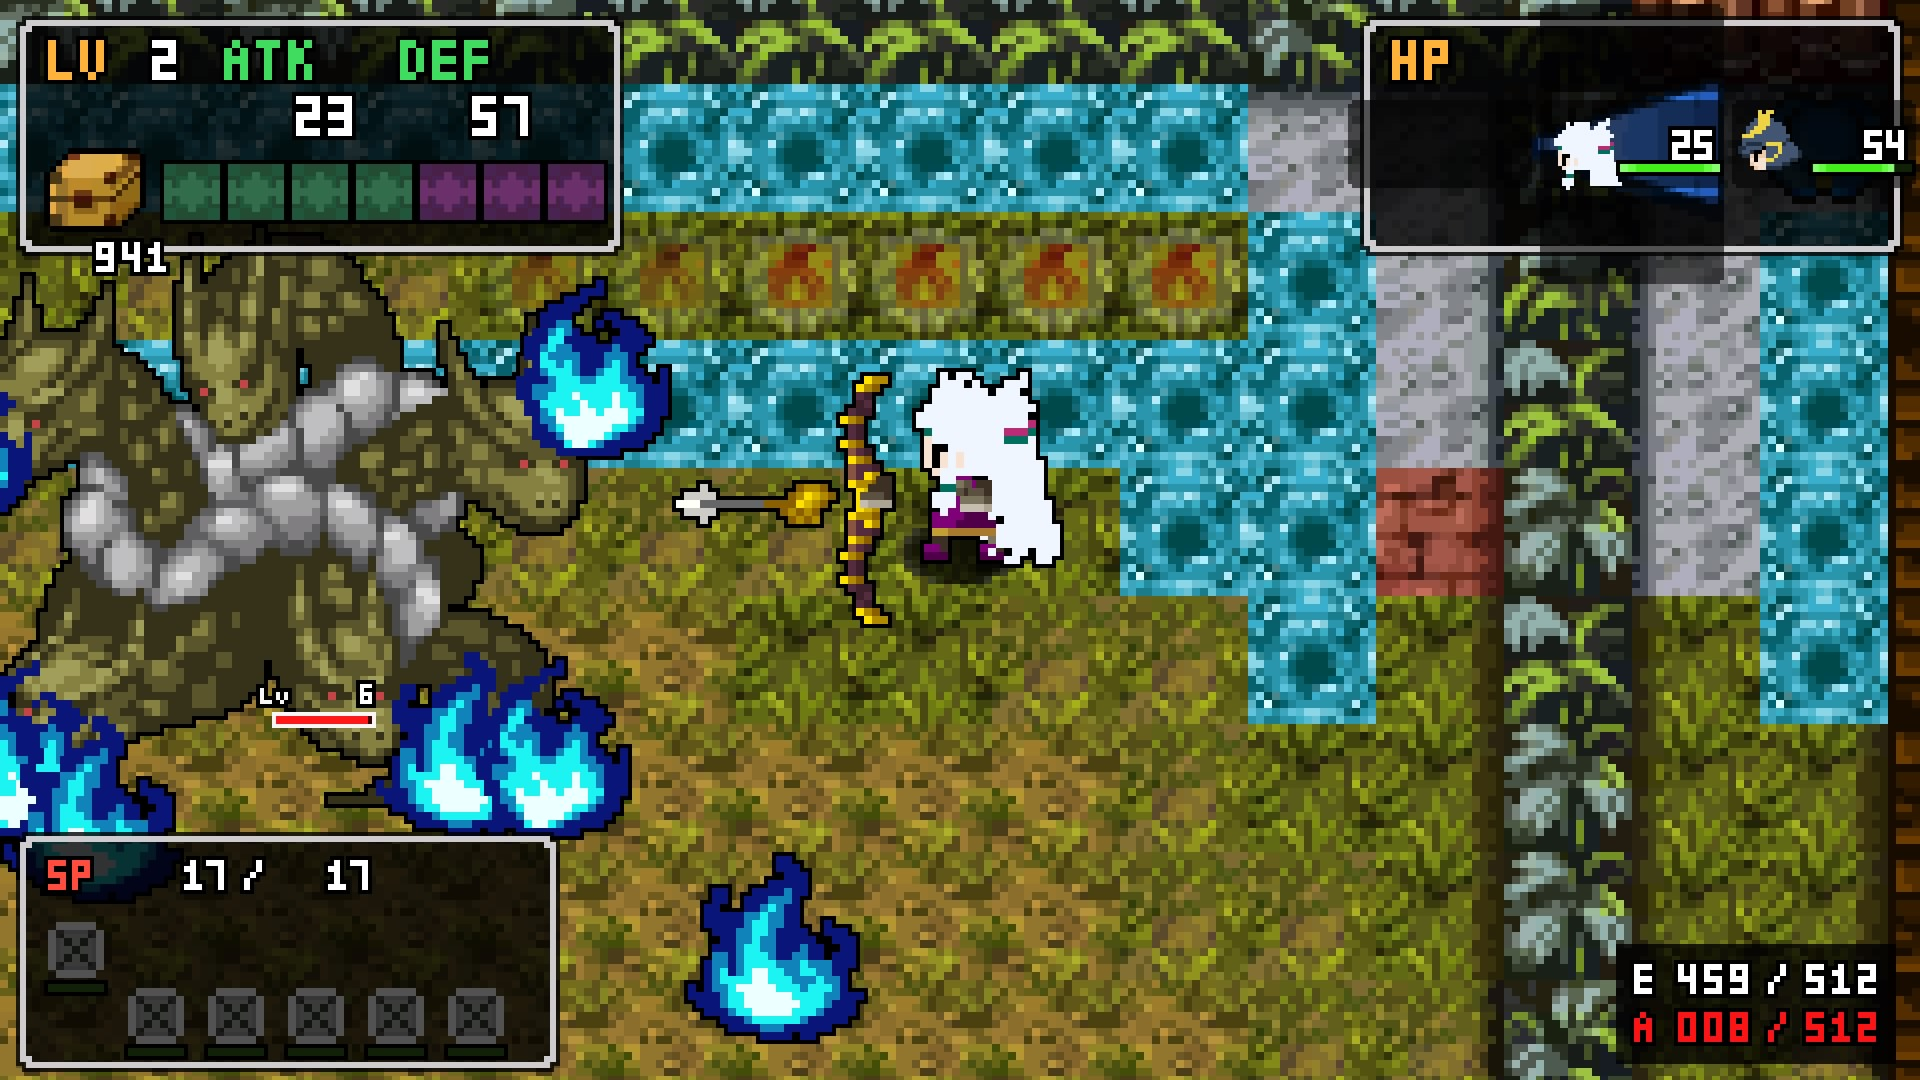 ClaDun Returns: This is Sengoku! Review - A Roguelike of